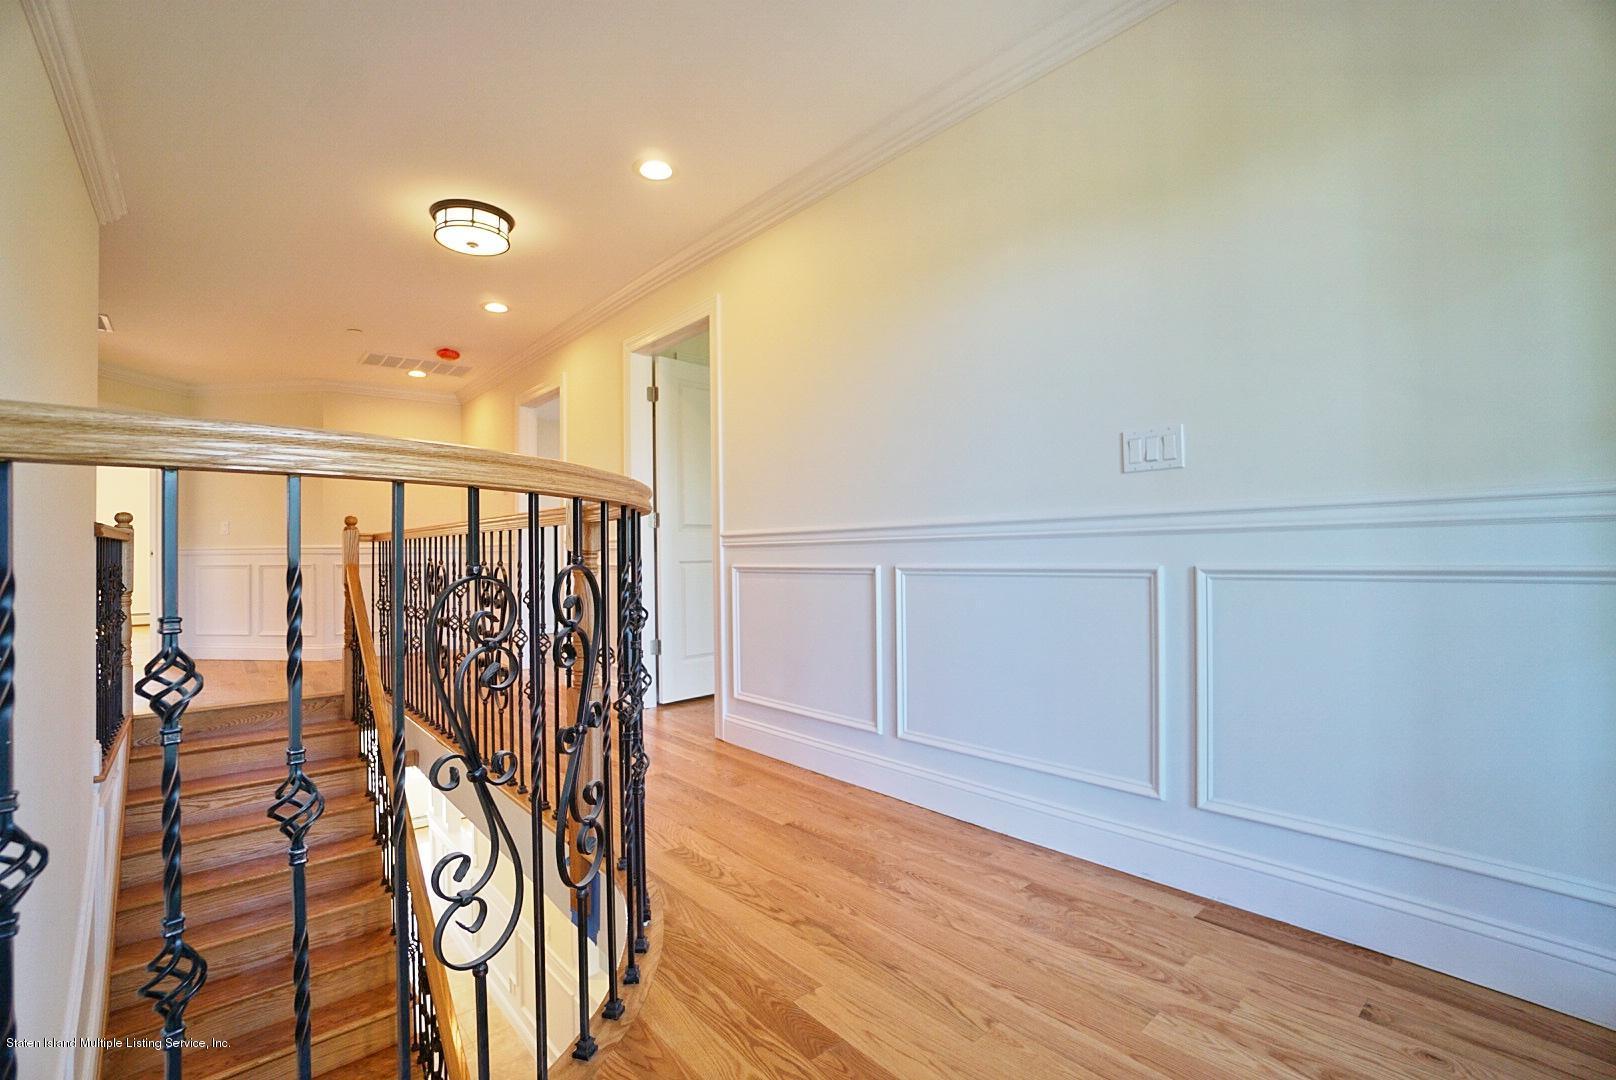 Single Family - Detached 678 Yetman Avenue  Staten Island, NY 10307, MLS-1132766-37